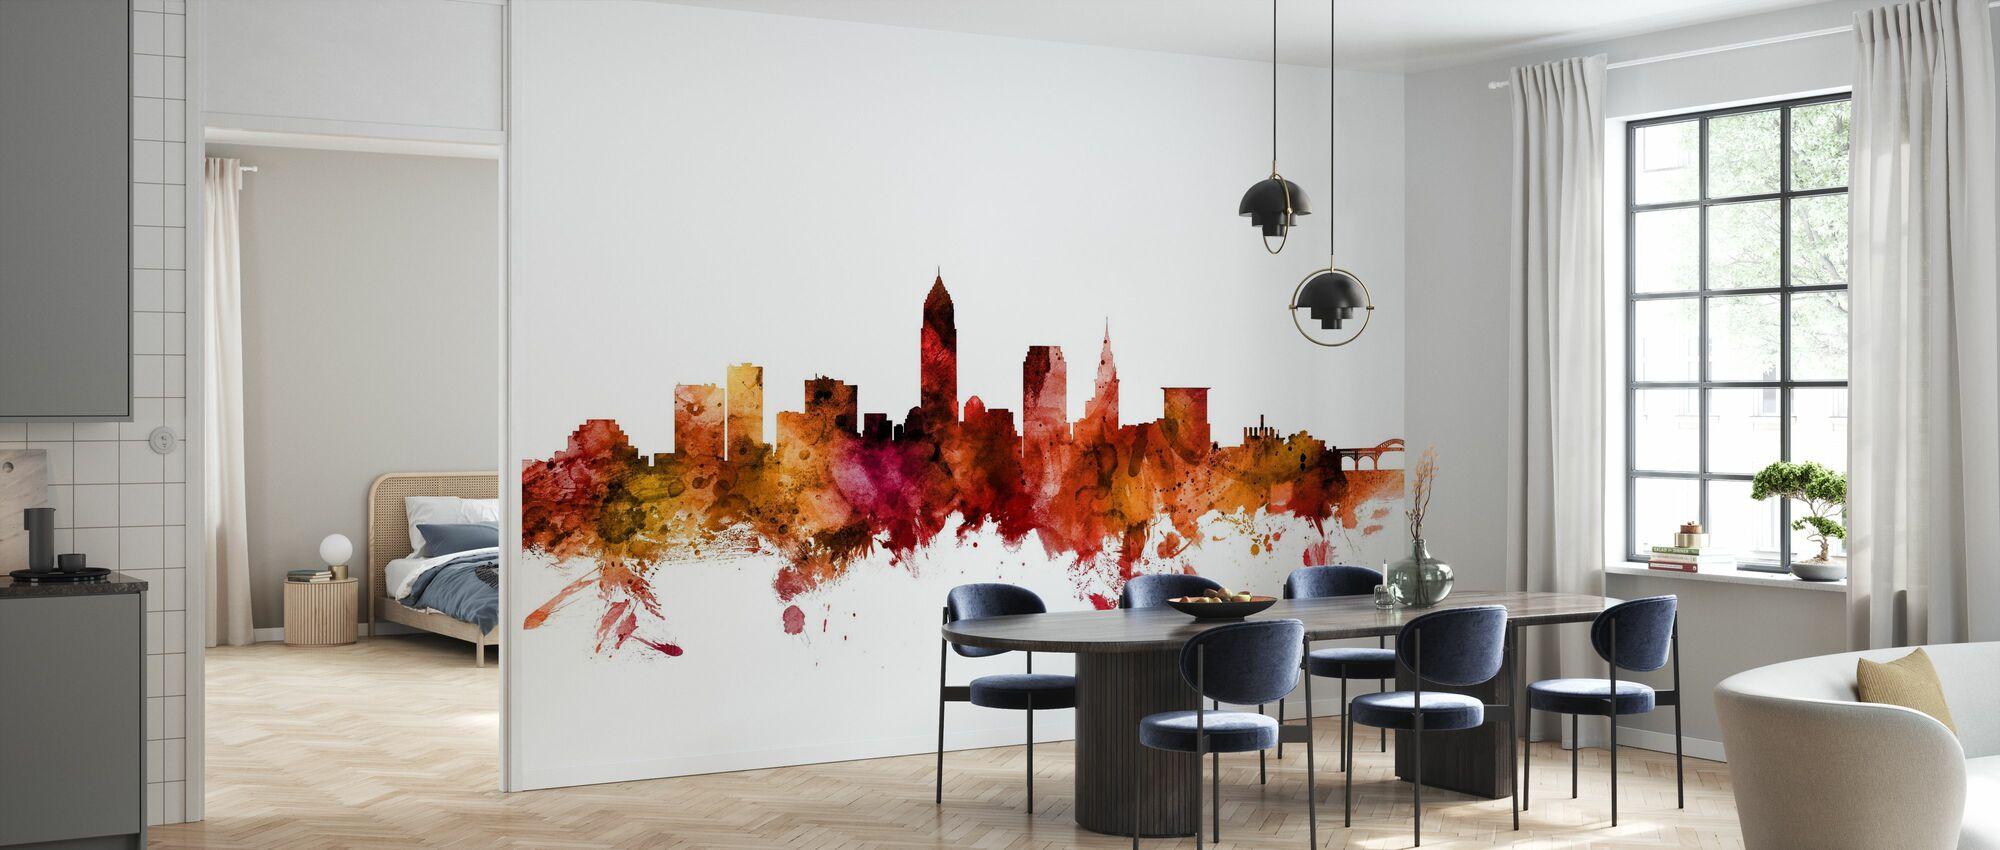 Cleveland Ohio Skyline - Behang - Keuken